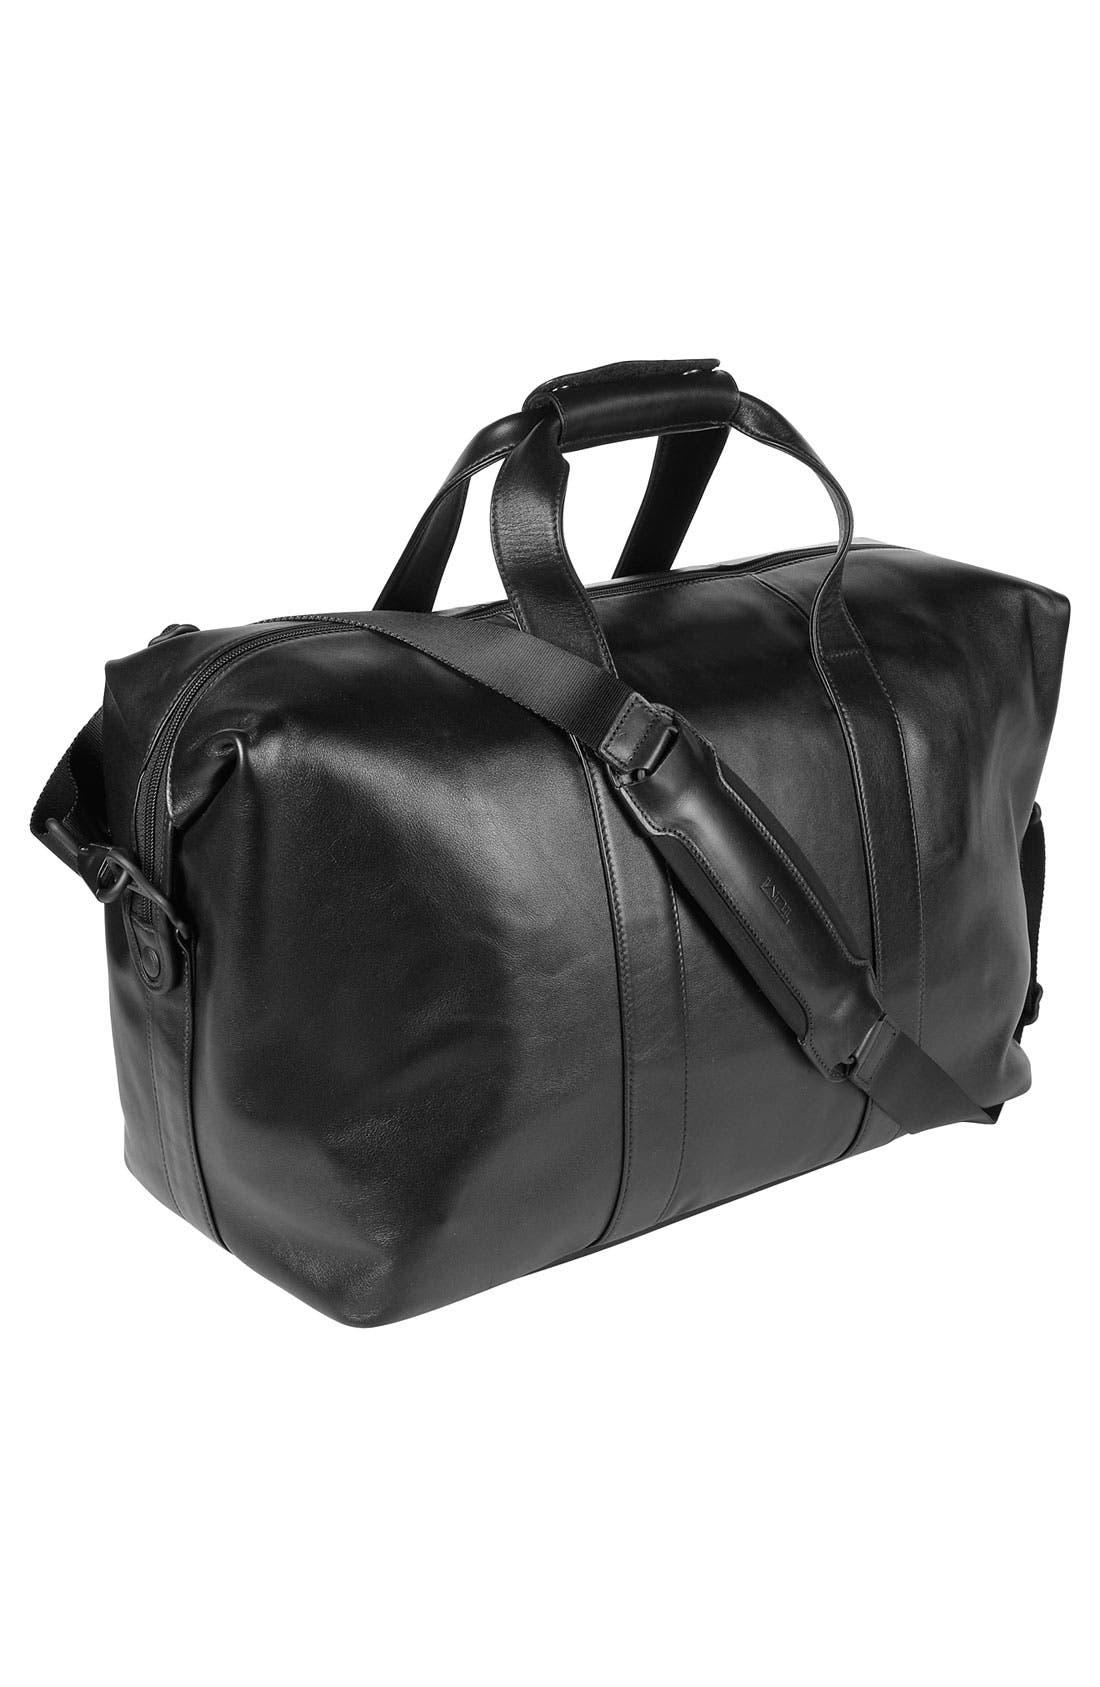 Main Image - Tumi 'Small Alpha' Soft Leather Travel Satchel